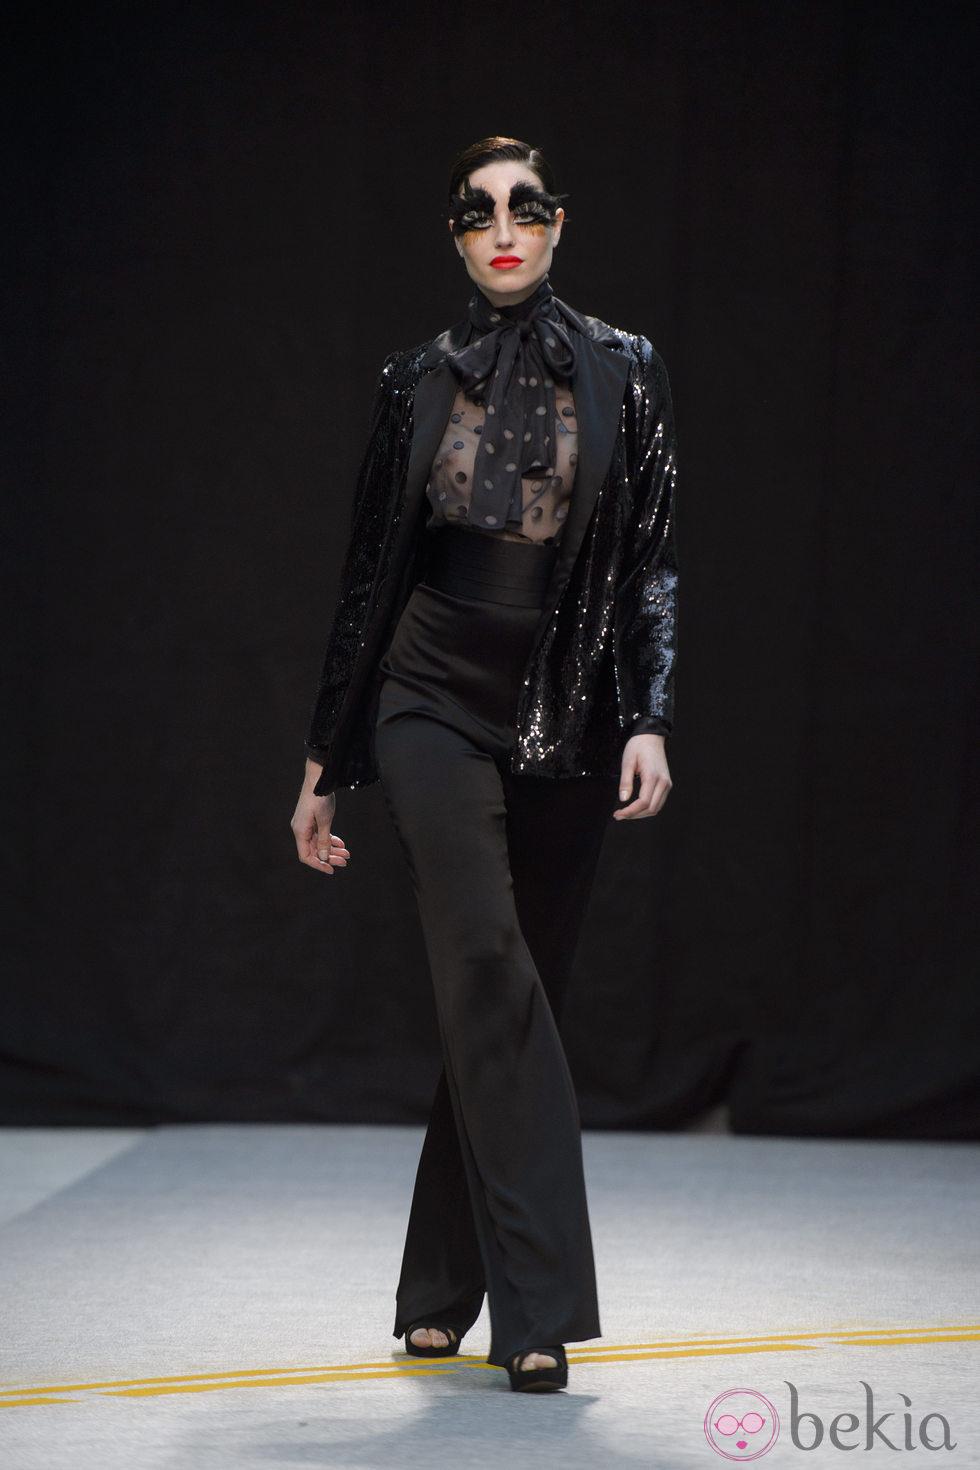 Maquillaje de ojos en negro de Maybelline NY en MFShow Women en Madrid